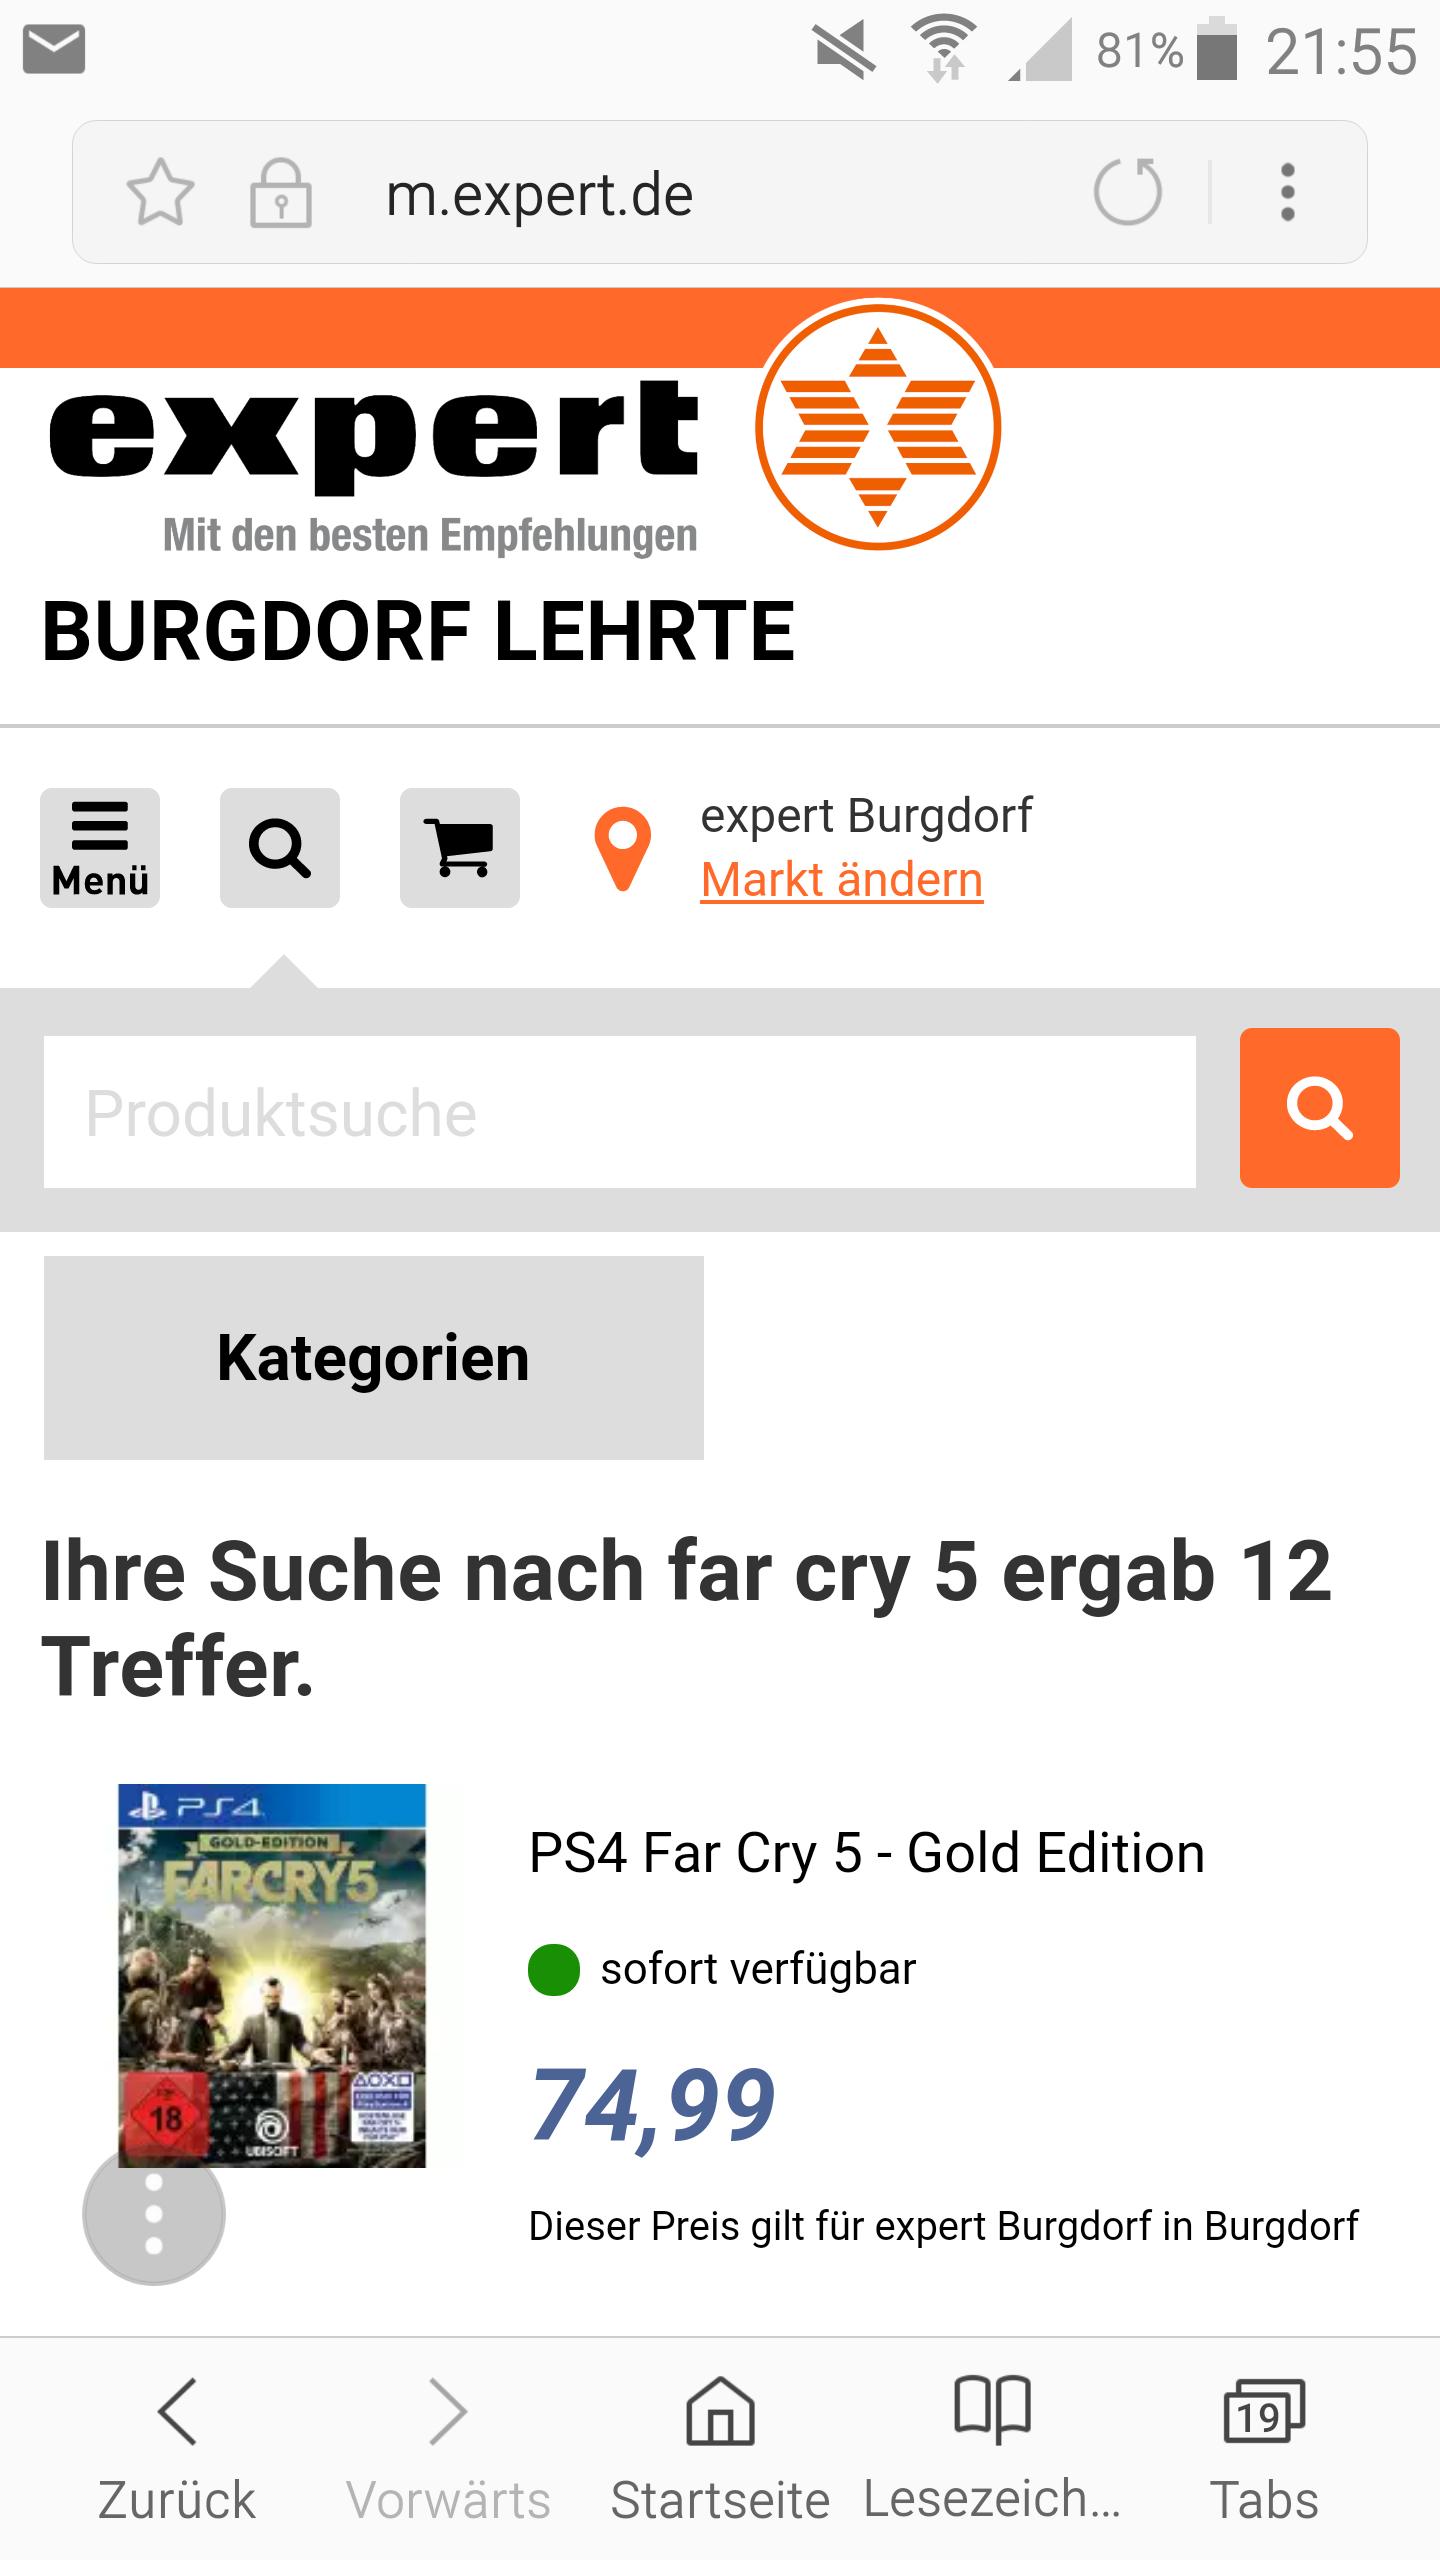 Far Cry 5 - Gold Edition (PlayStation 4) bei expert im Angebot (evtl. nur lokal/Burgdorf)